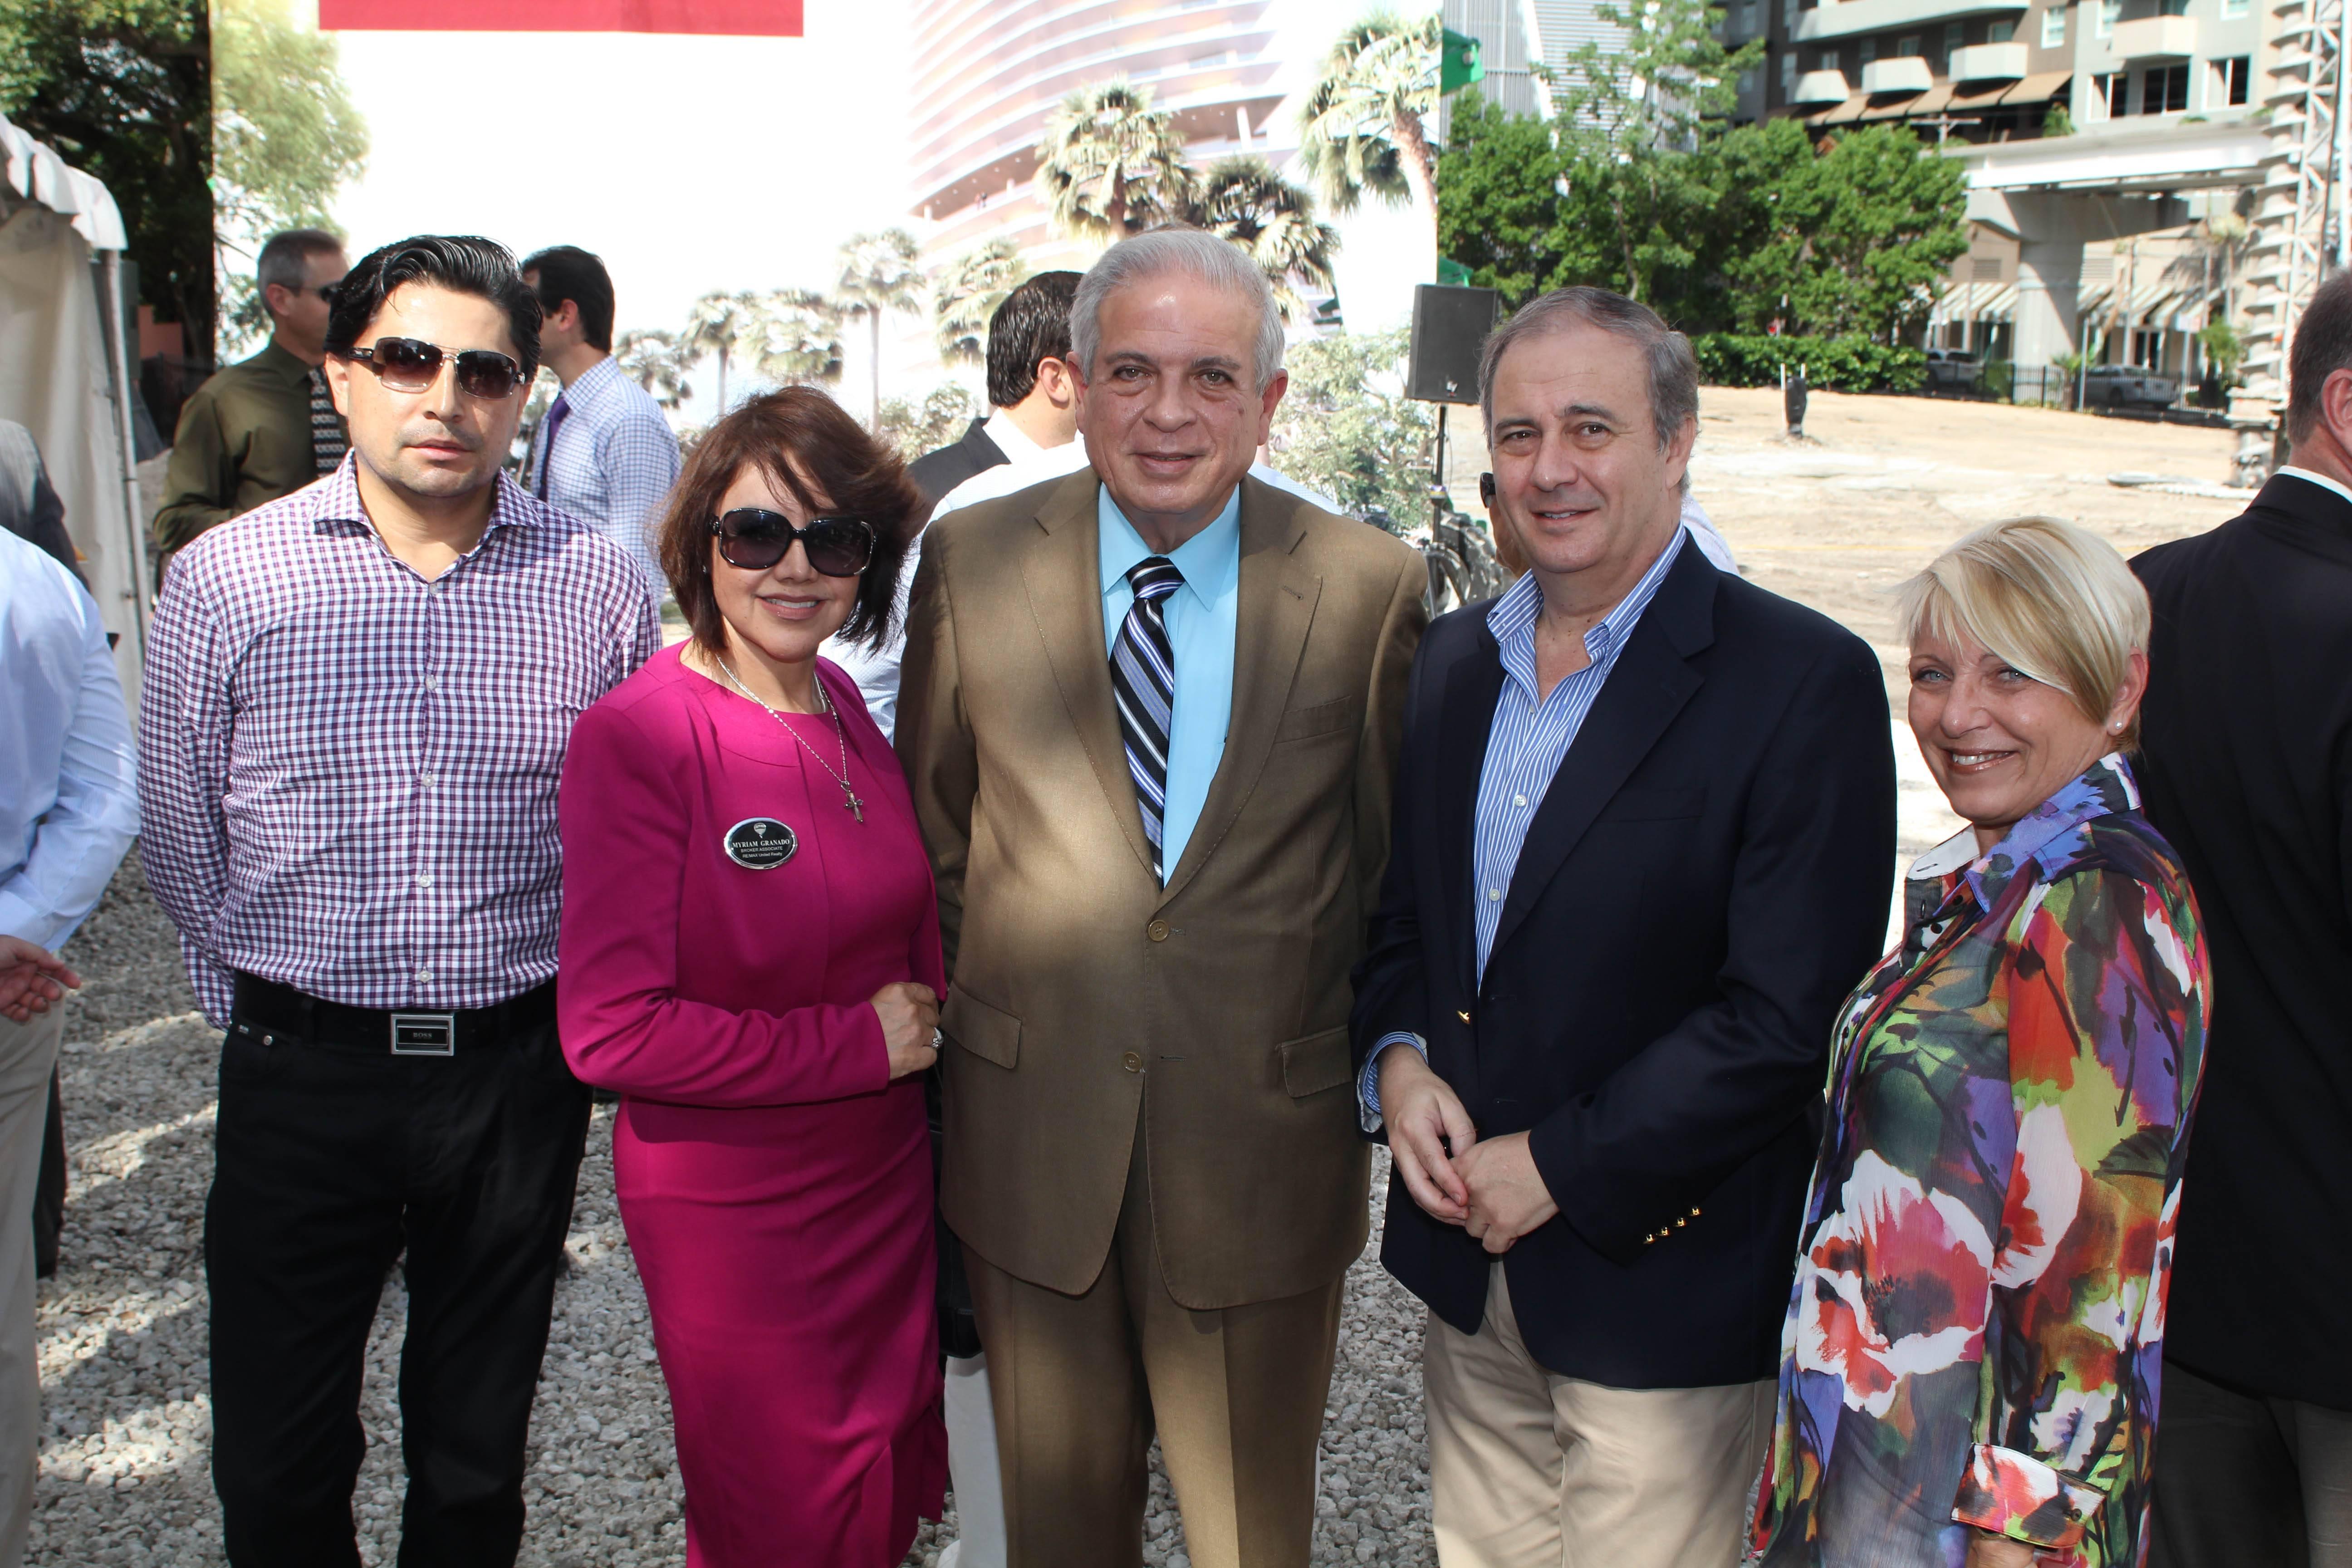 Jaime Albarracin, Myriam Granado, Mayor Regalado, Sergio Lemme, Debi Quade